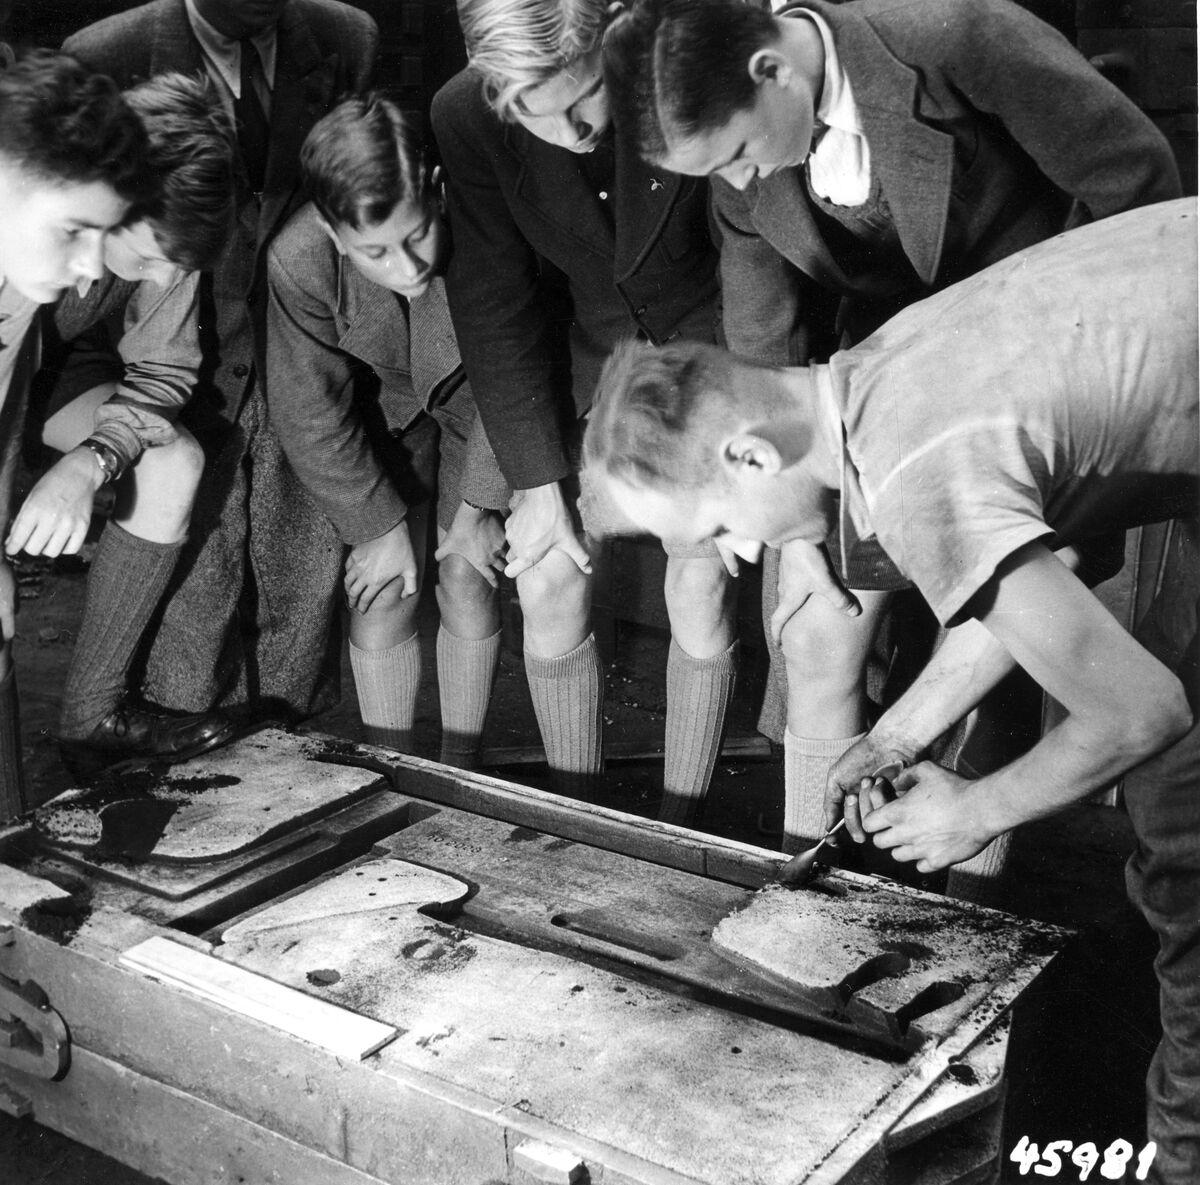 GFA 12/45981: Reportage casting process in malleable casting